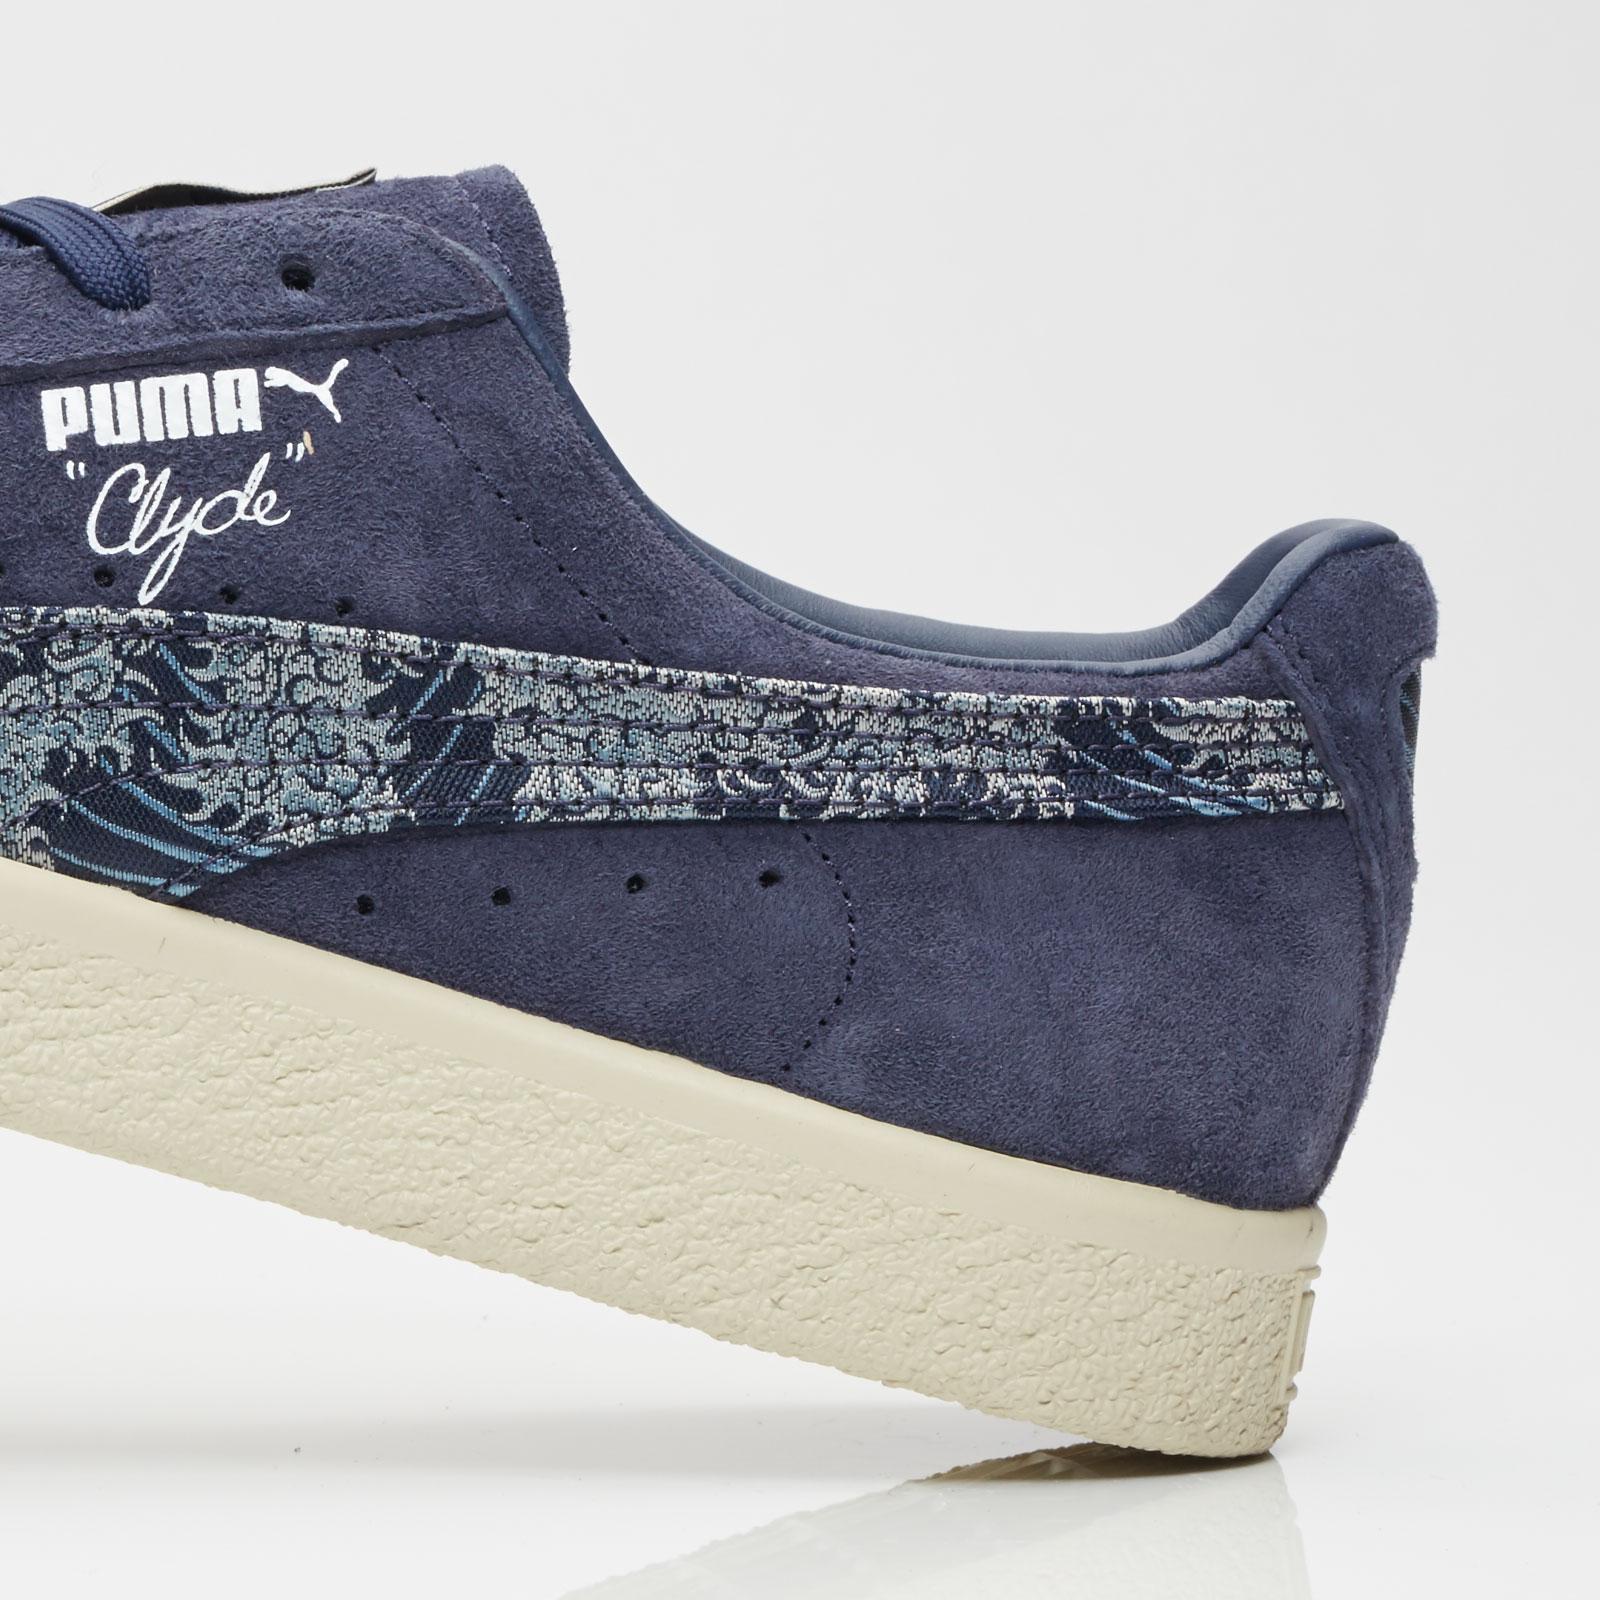 new product dd054 7a82f Puma Puma Clyde Marine FM - 364787-01 - Sneakersnstuff ...